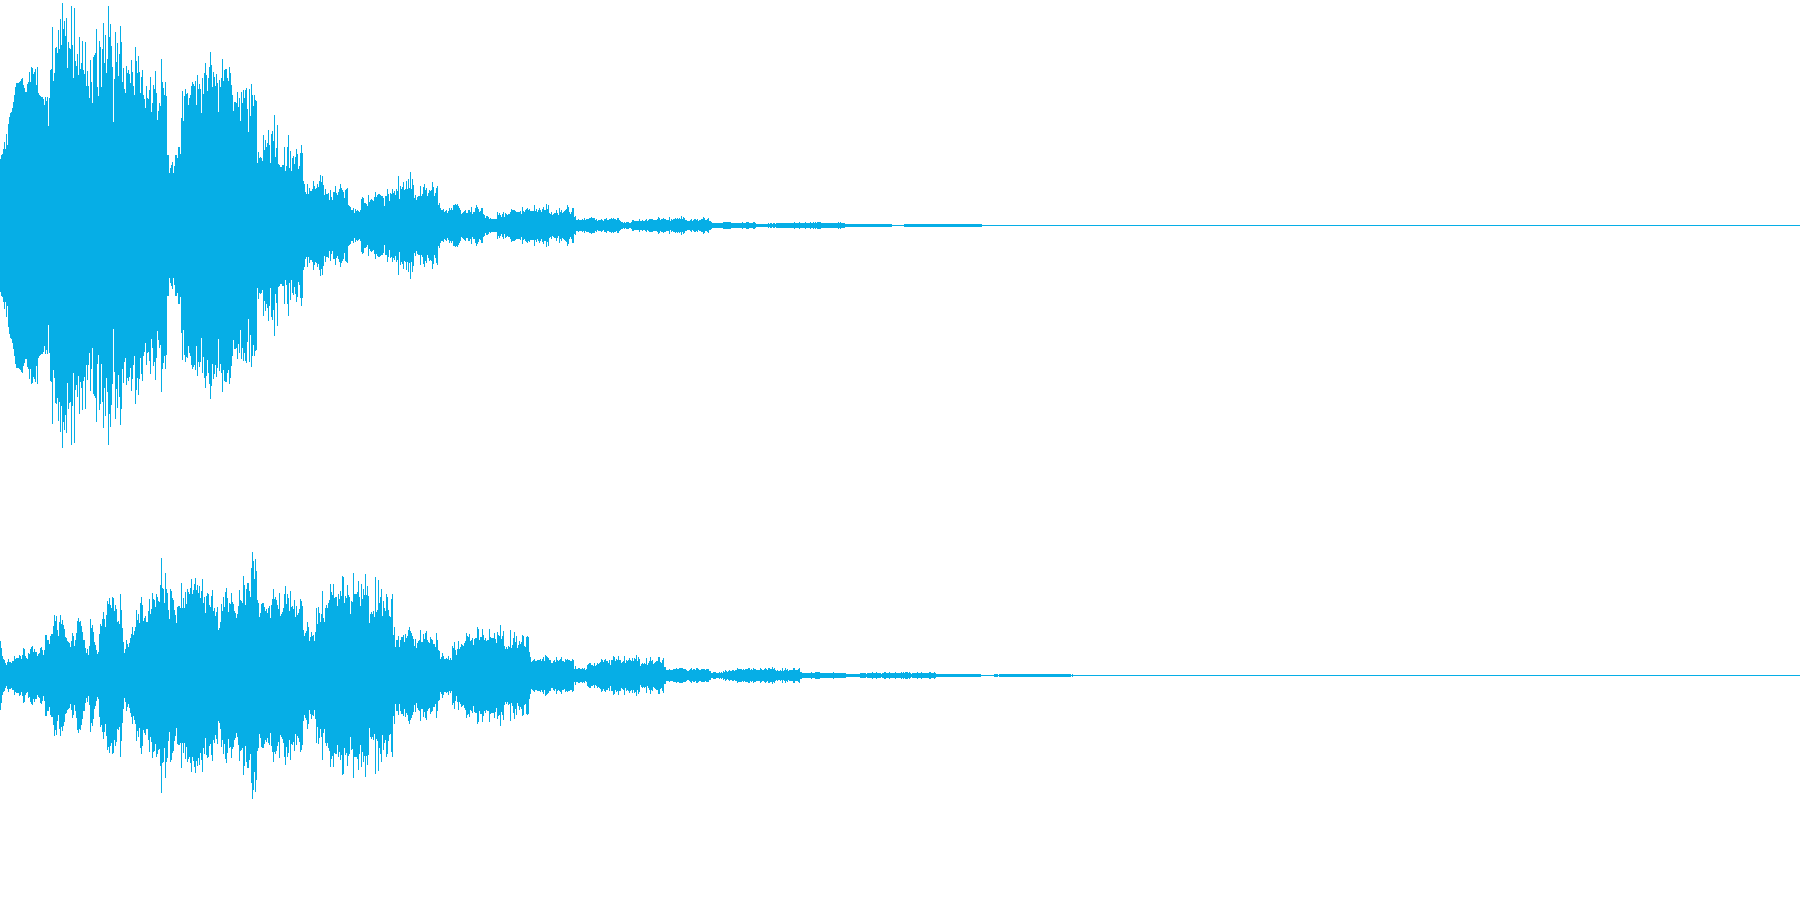 RPG アイテムゲット音の再生済みの波形